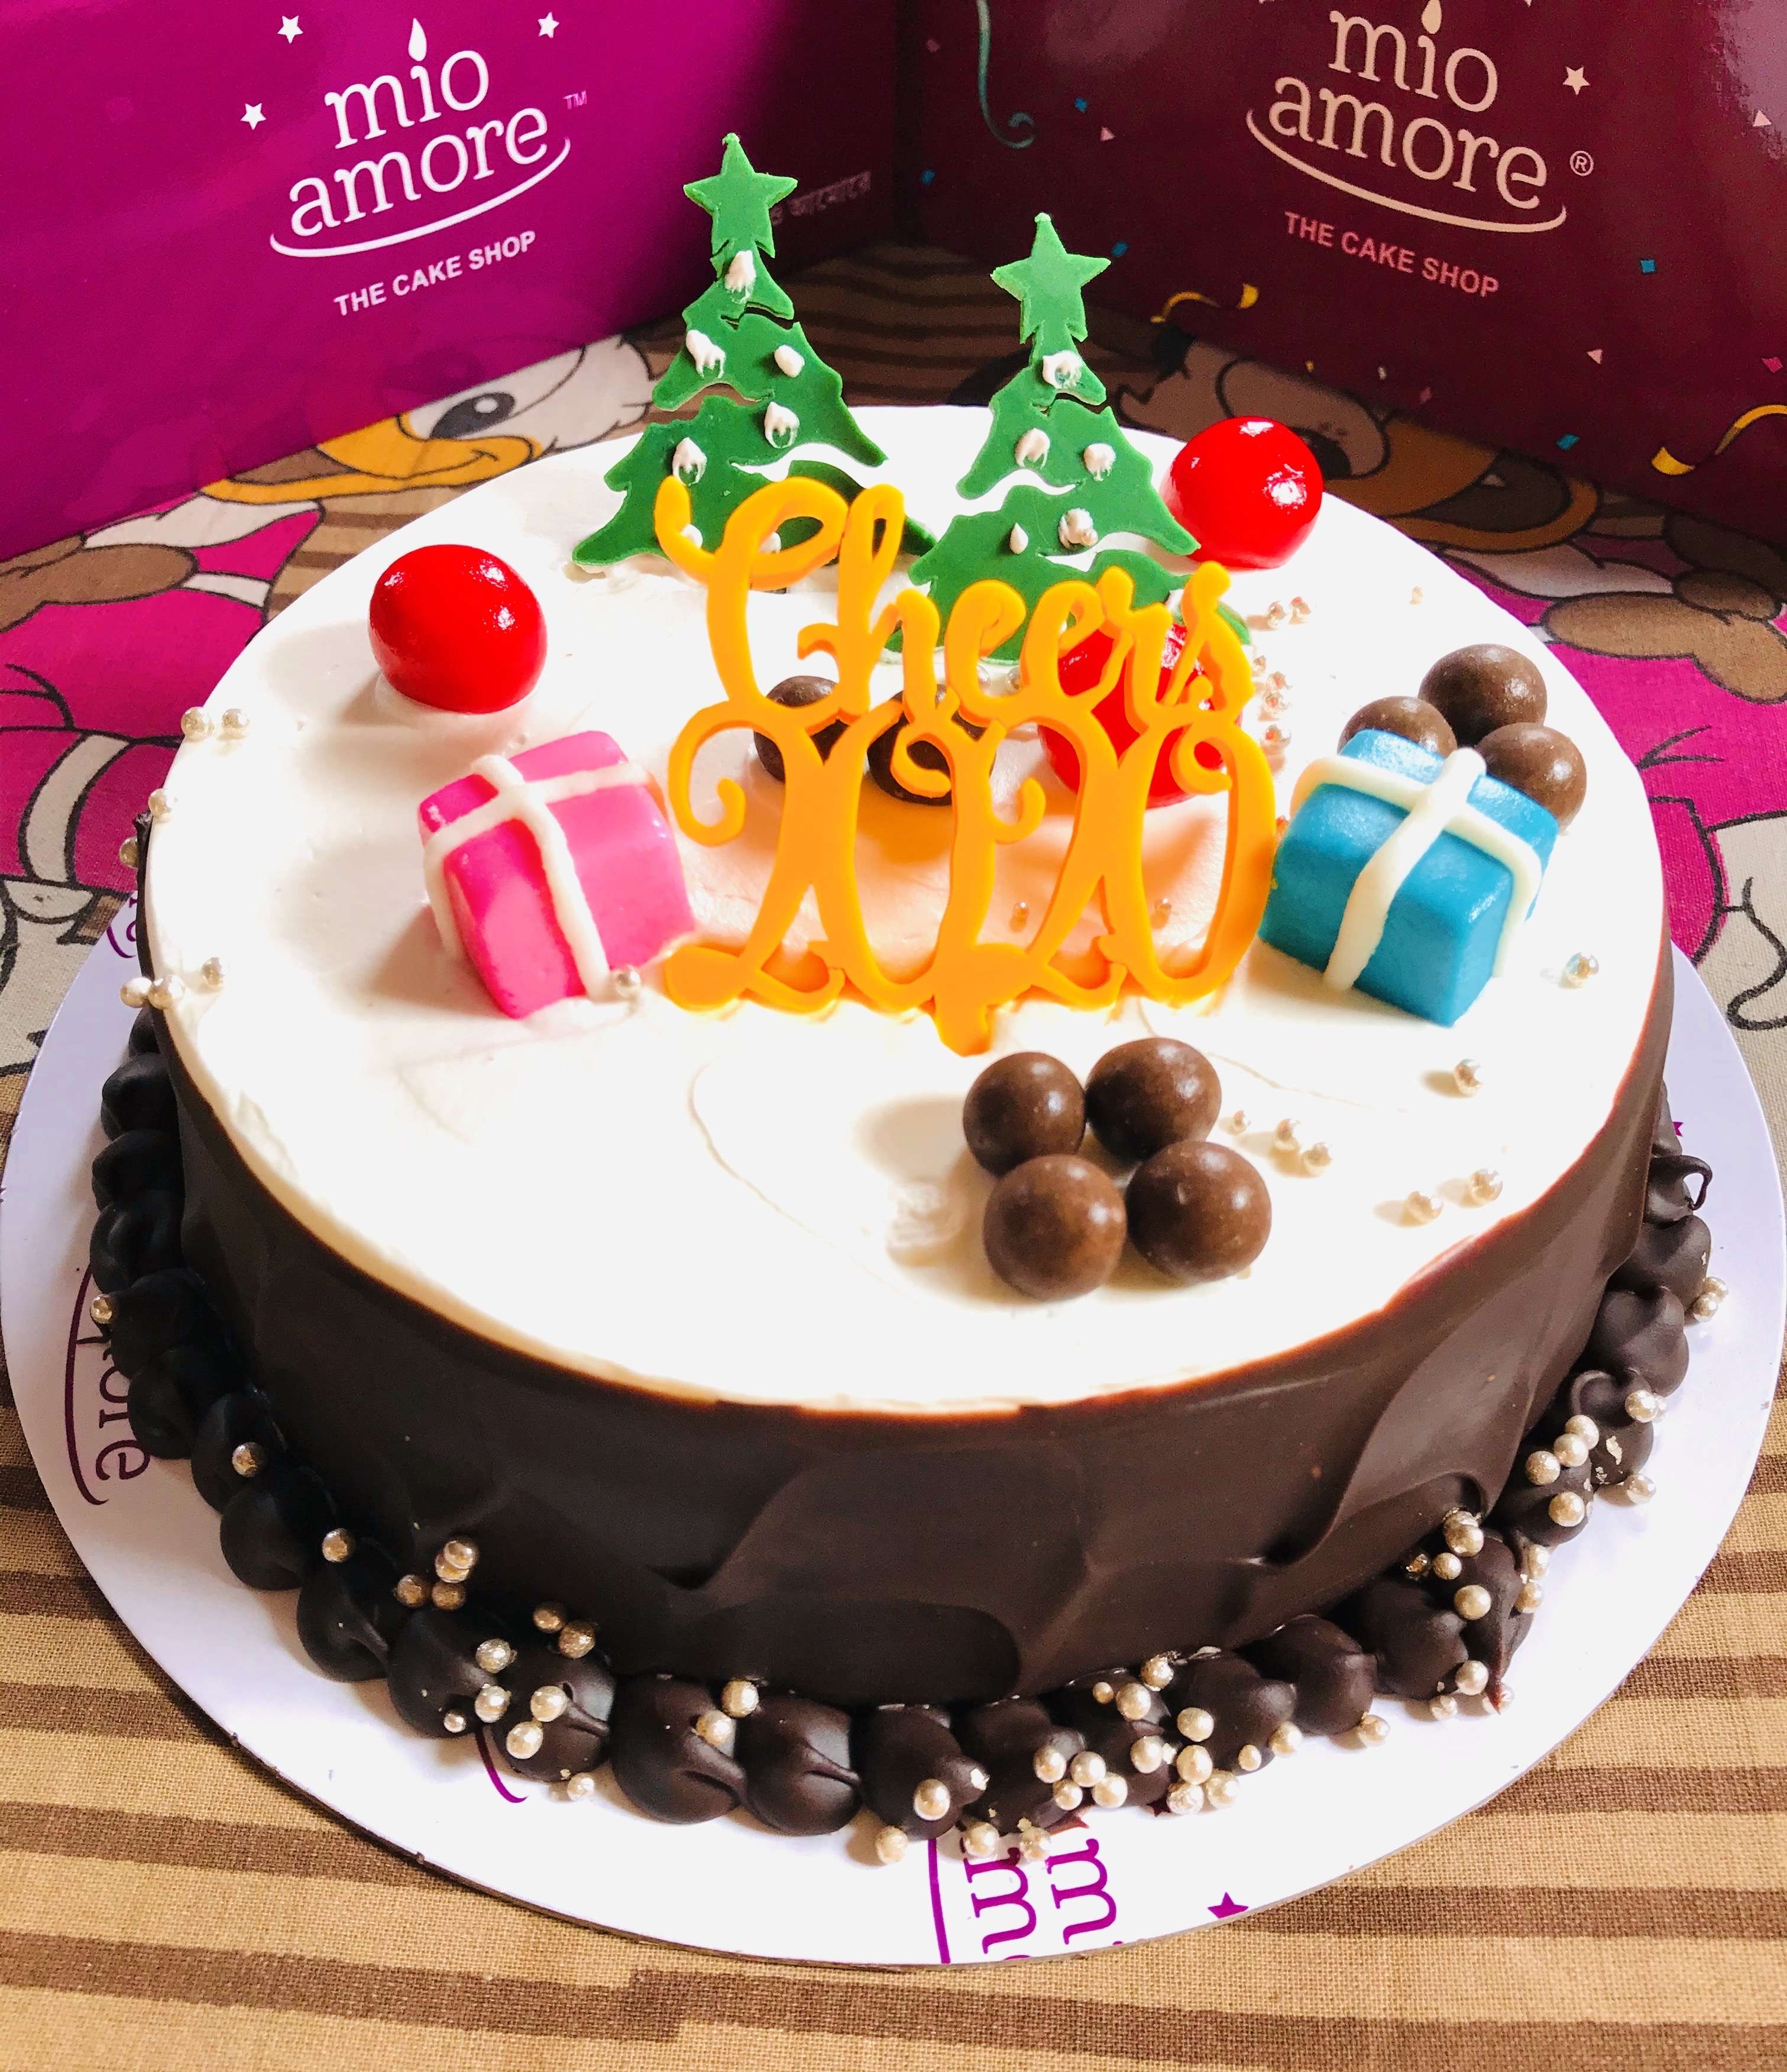 Magnificent Mio Amore Shobha Bazar Kolkata Restaurant Personalised Birthday Cards Epsylily Jamesorg